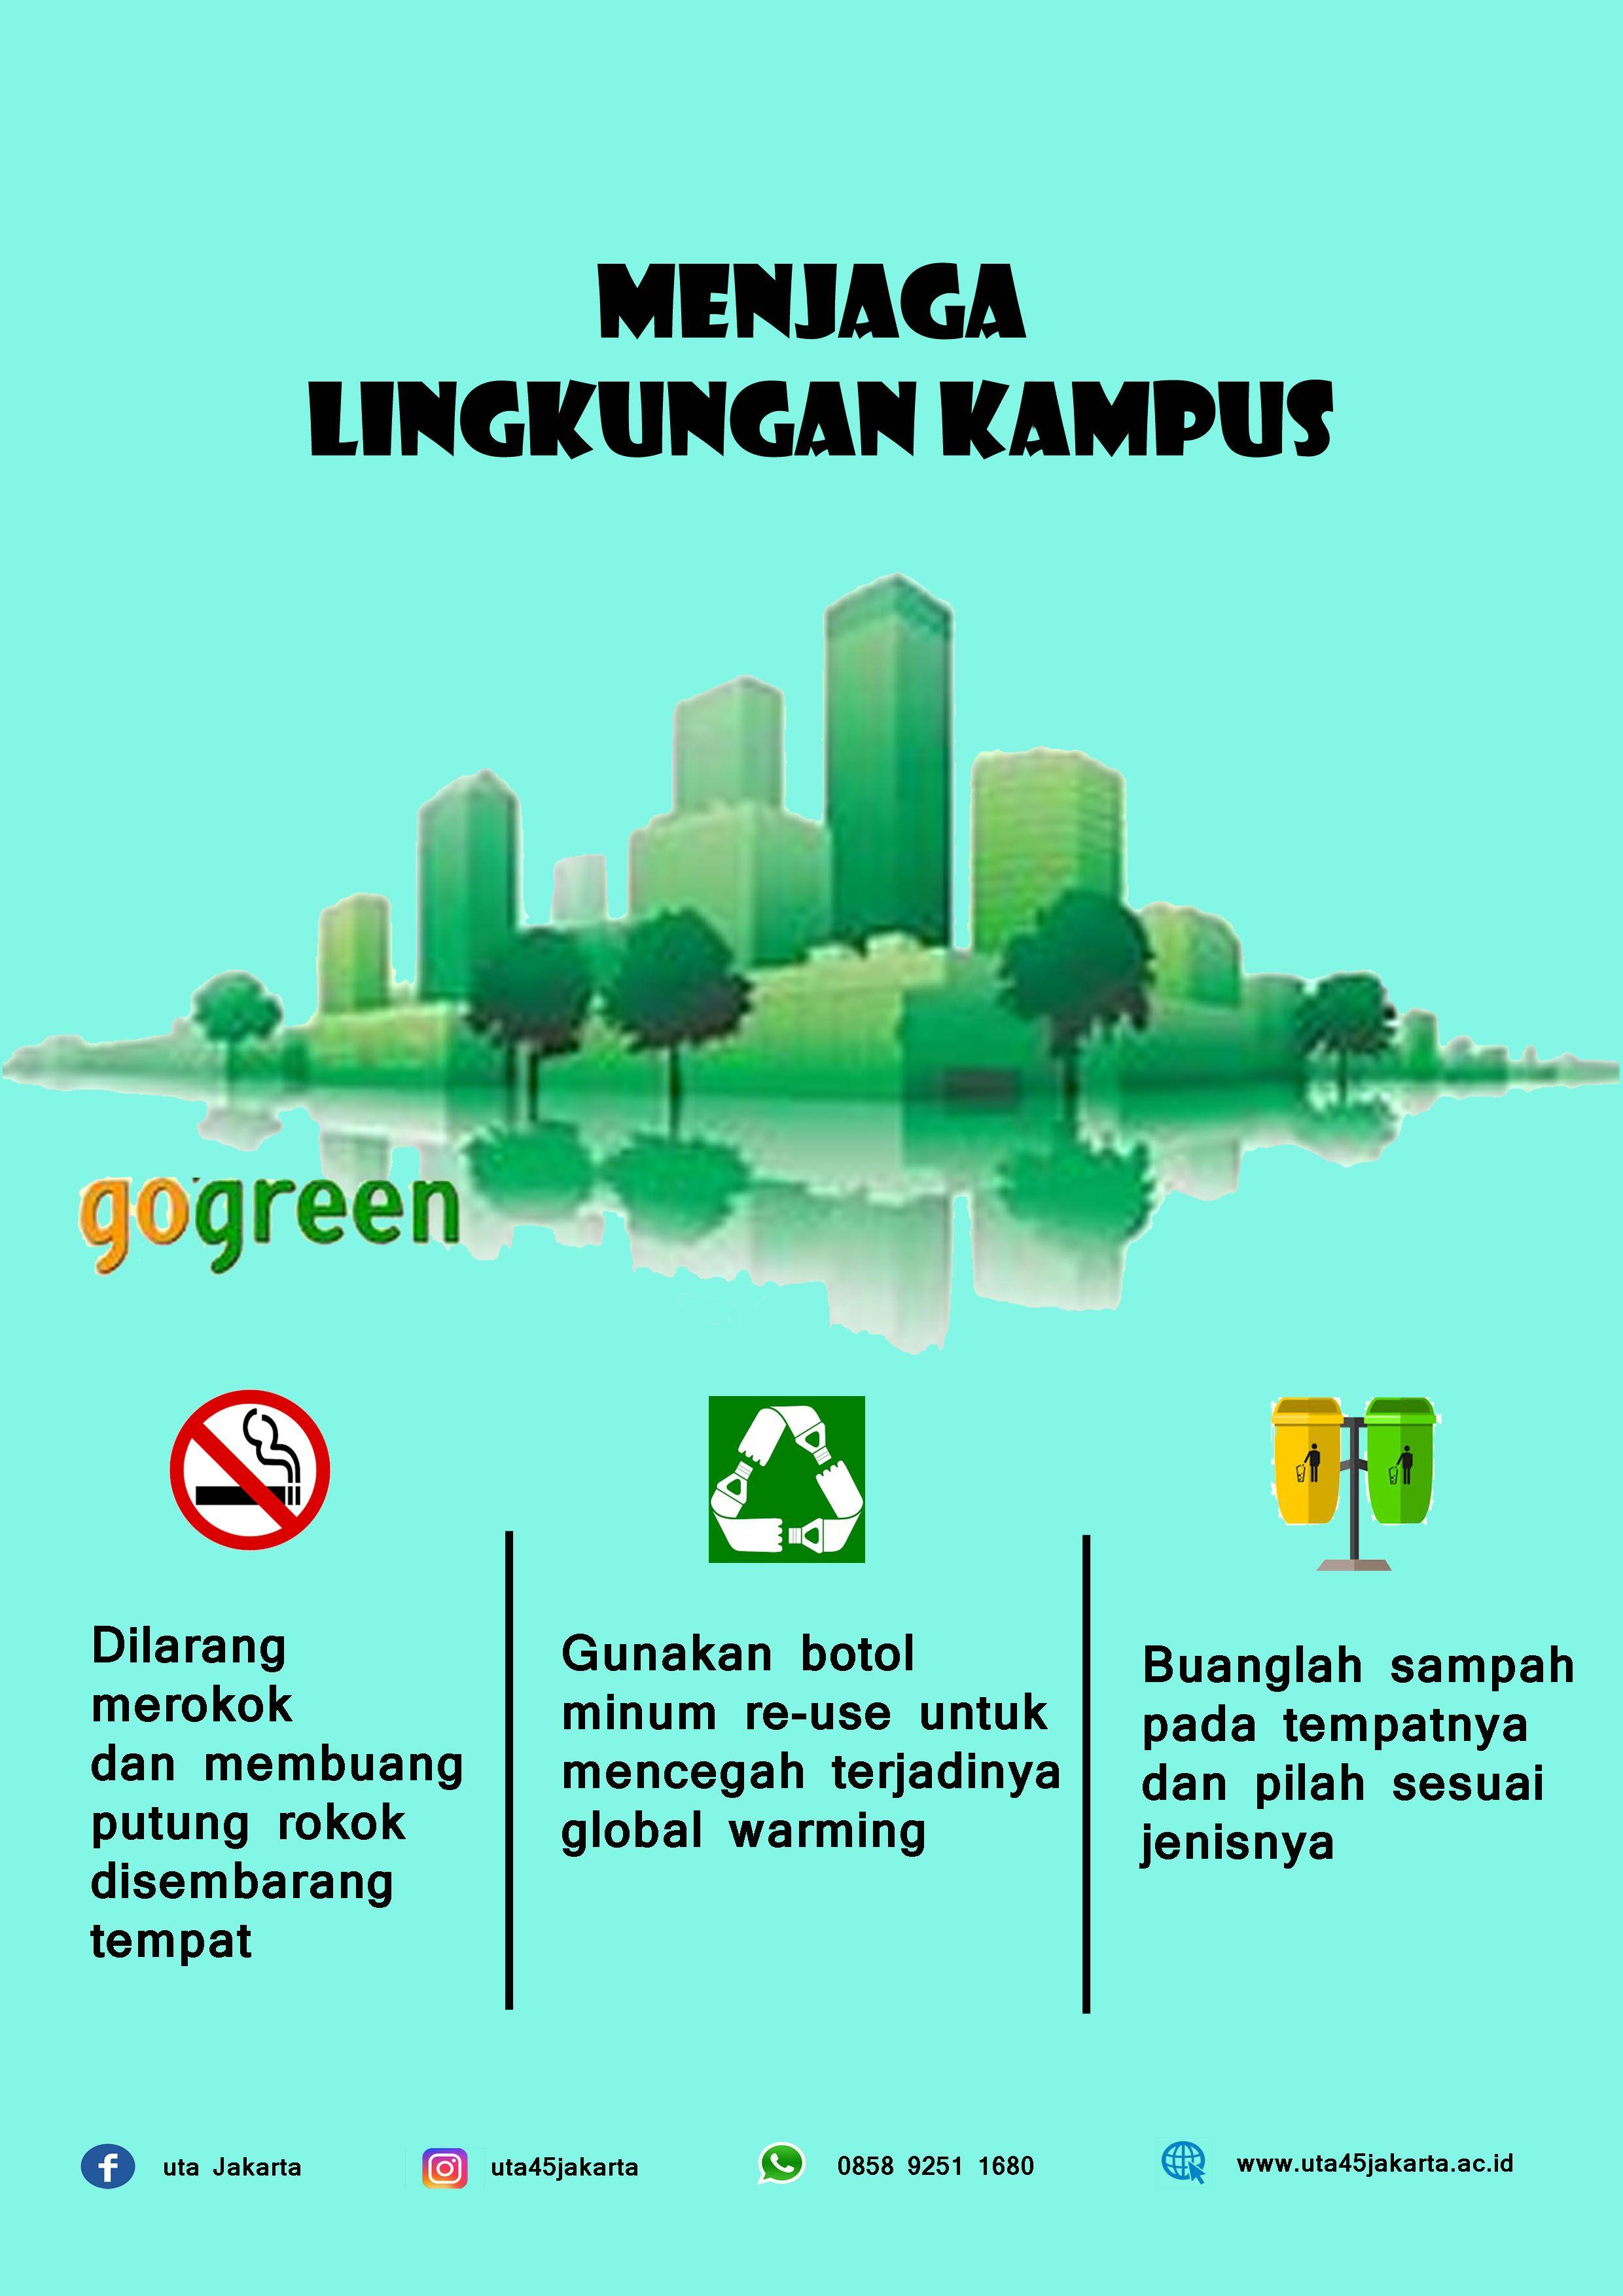 Artikel Poster Menjaga Lingkungan Kampus Halaman 1 Kompasiana Com